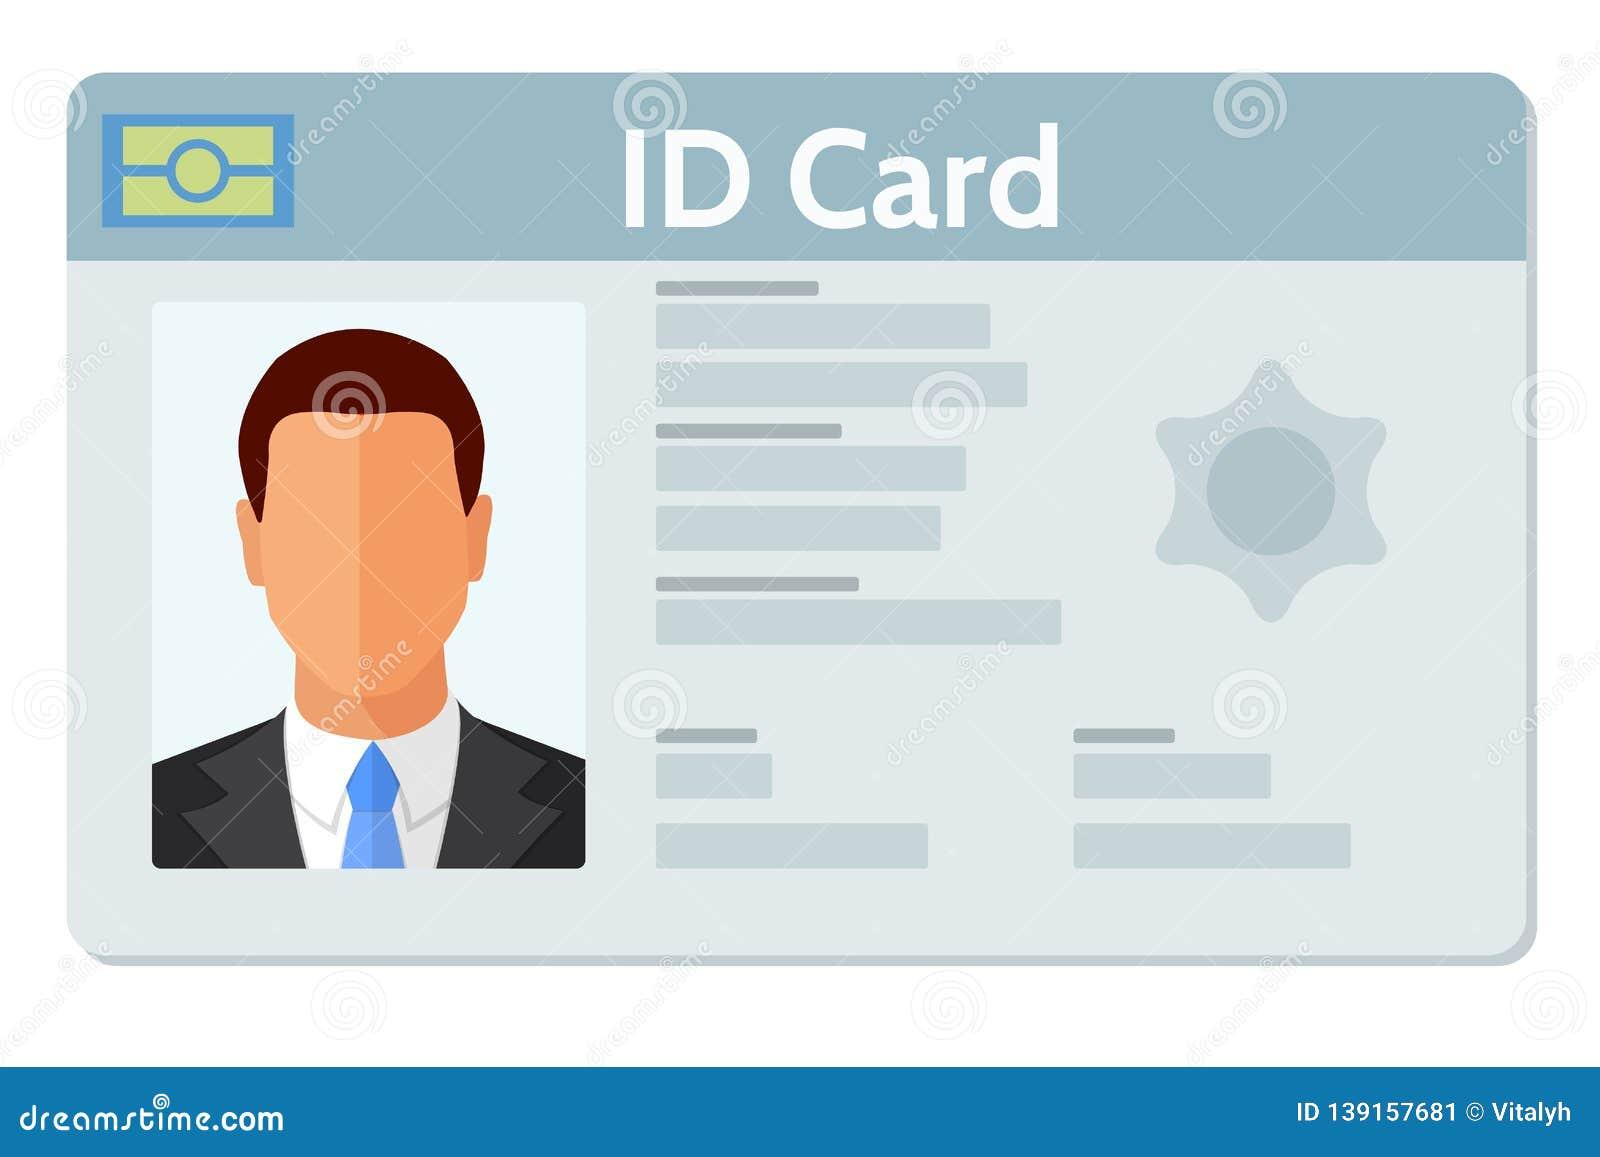 Illustration Vector 139157681 Flat Card - Identity Design Background Style Of Design Stock Id